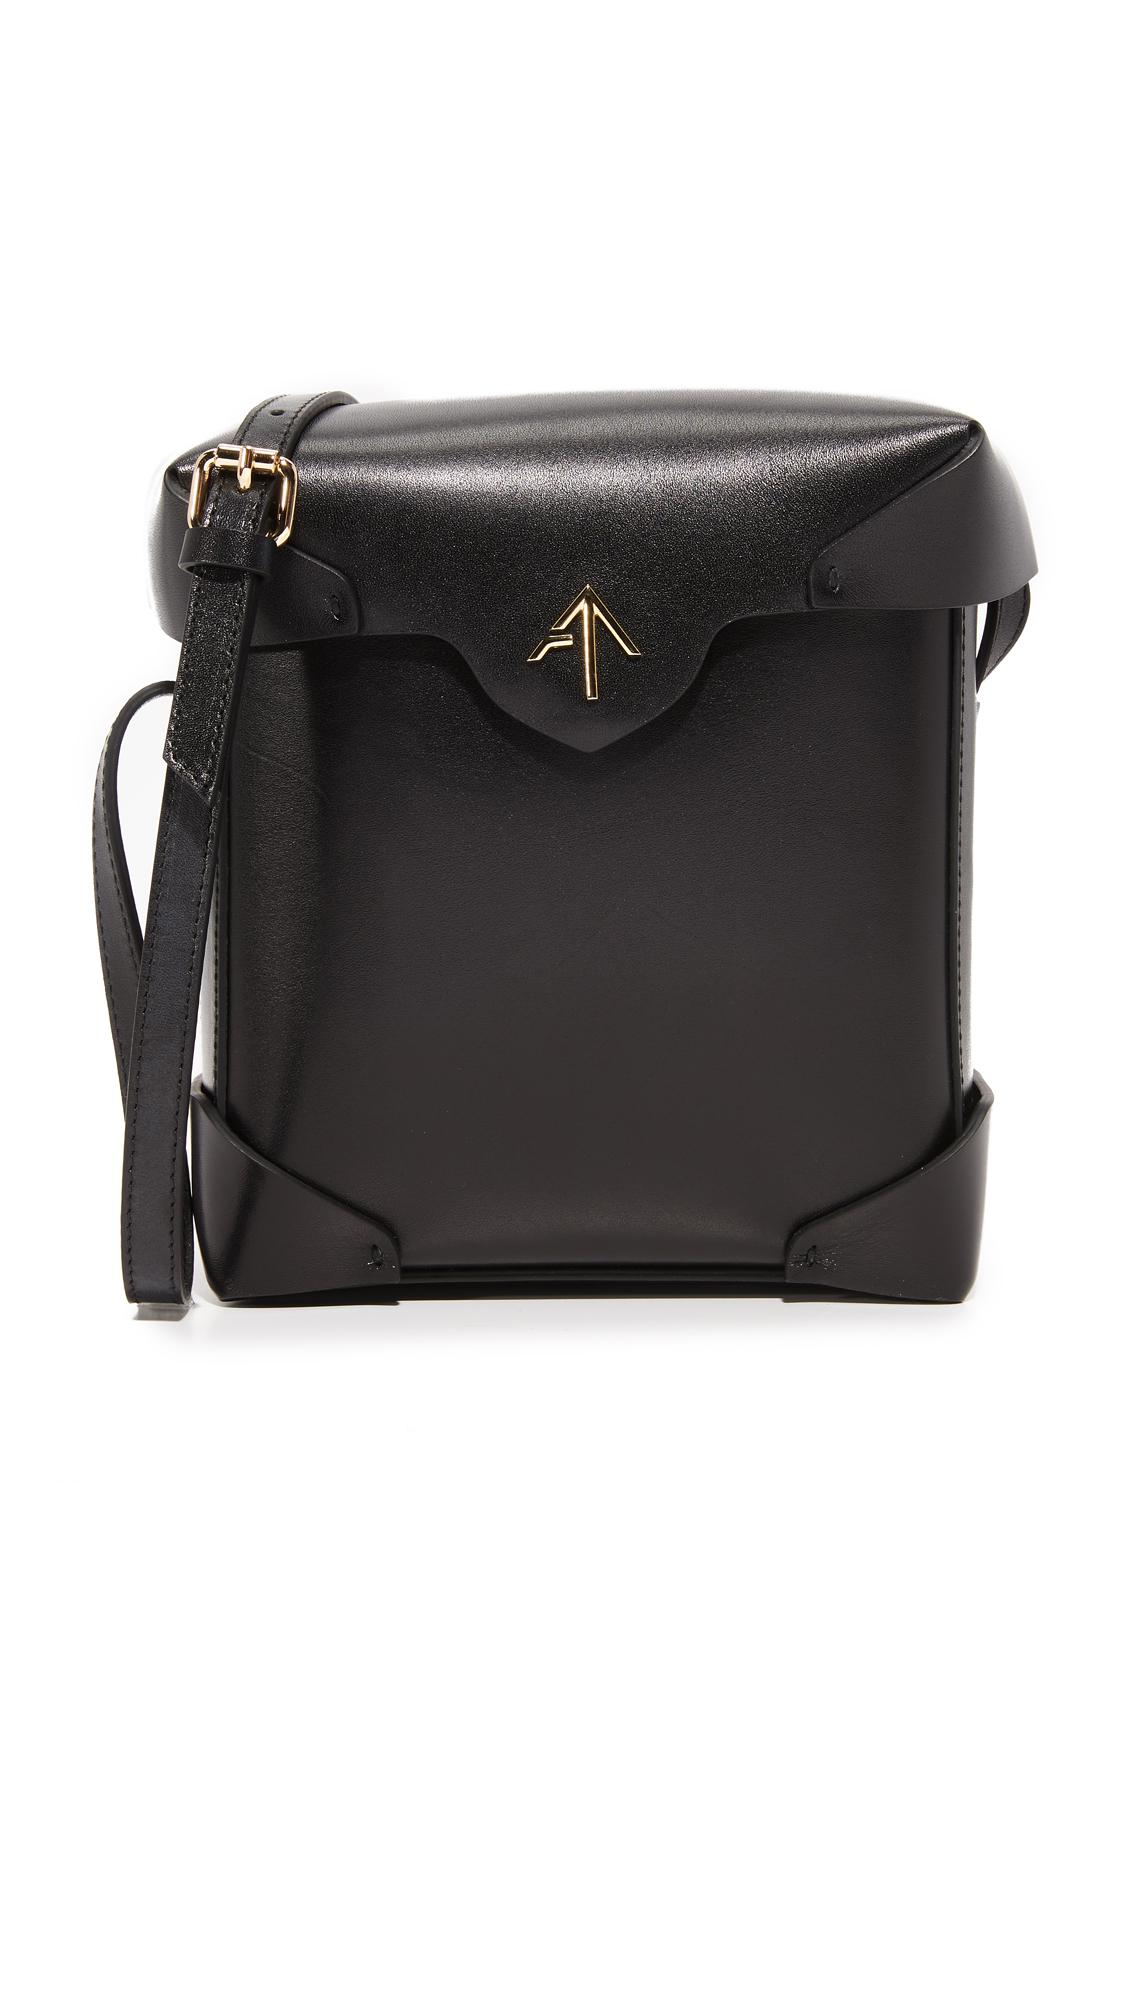 Mini Pristine Combo Tweed Box Bag Manu Atelier Cheap Price In China ldwtgO5